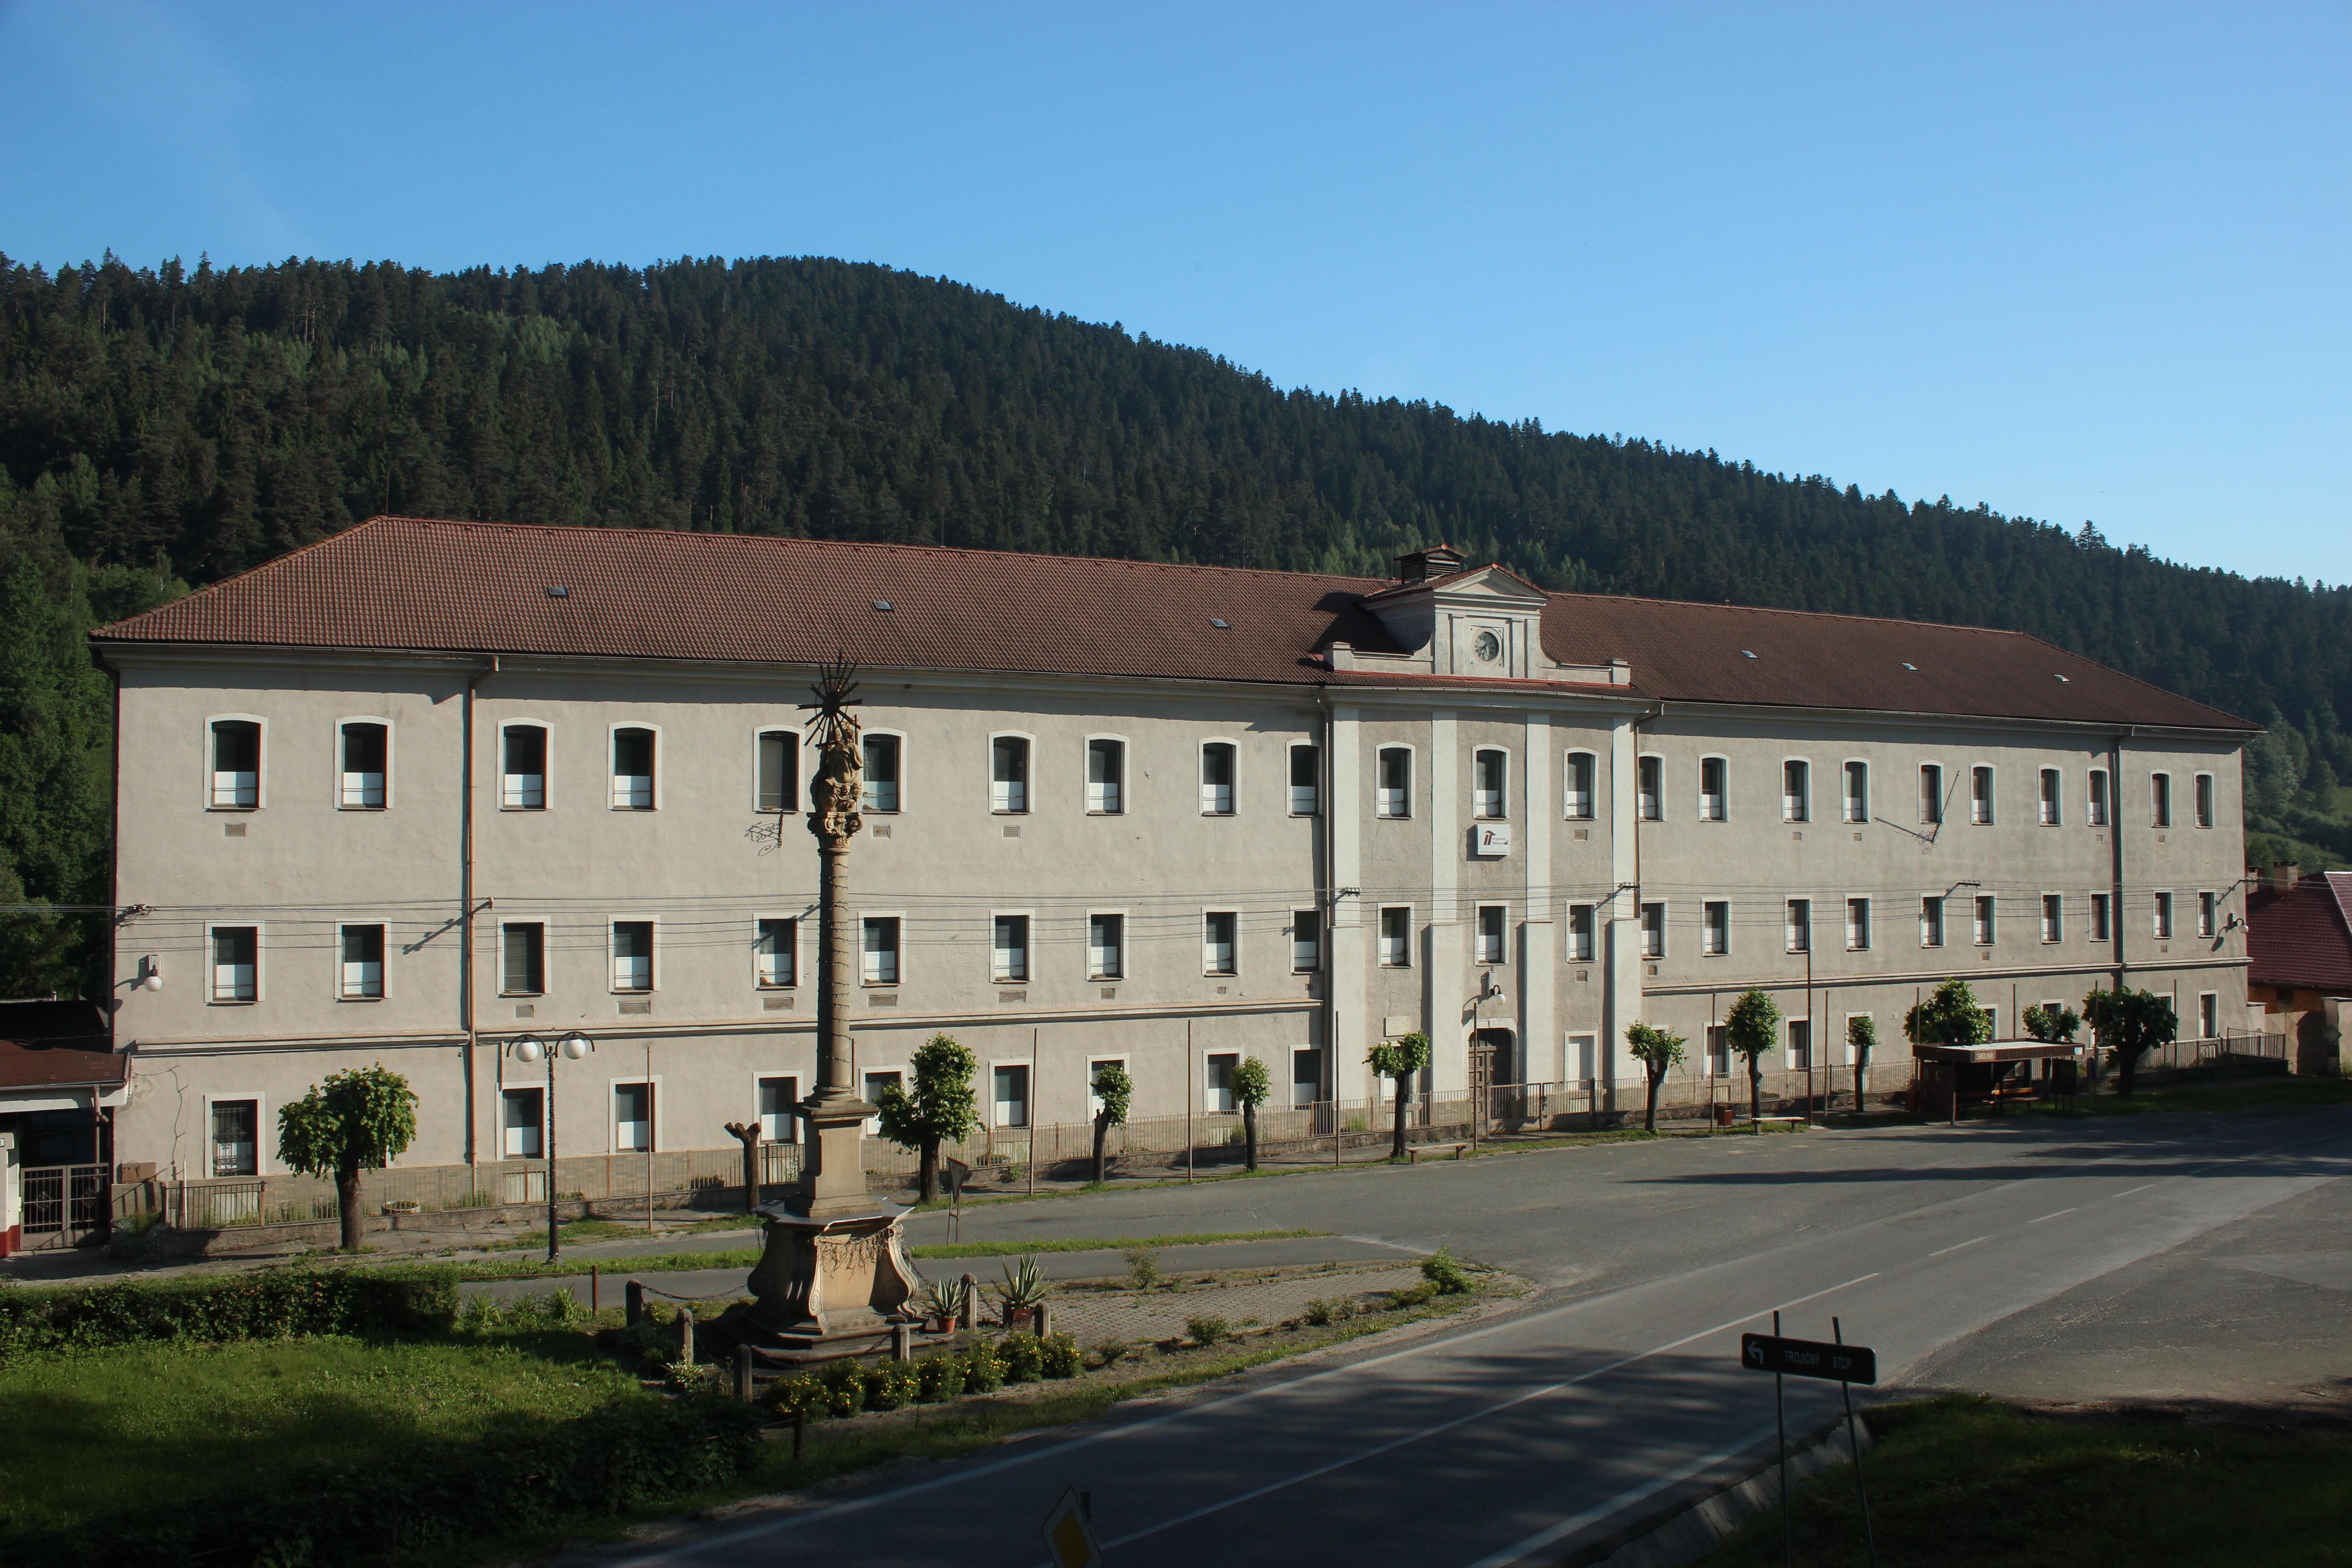 Banská história obce Smolník siaha až do 11. storočia. Bývalá tabaková továreň ako jedna z mála budov ešte stále stojí.